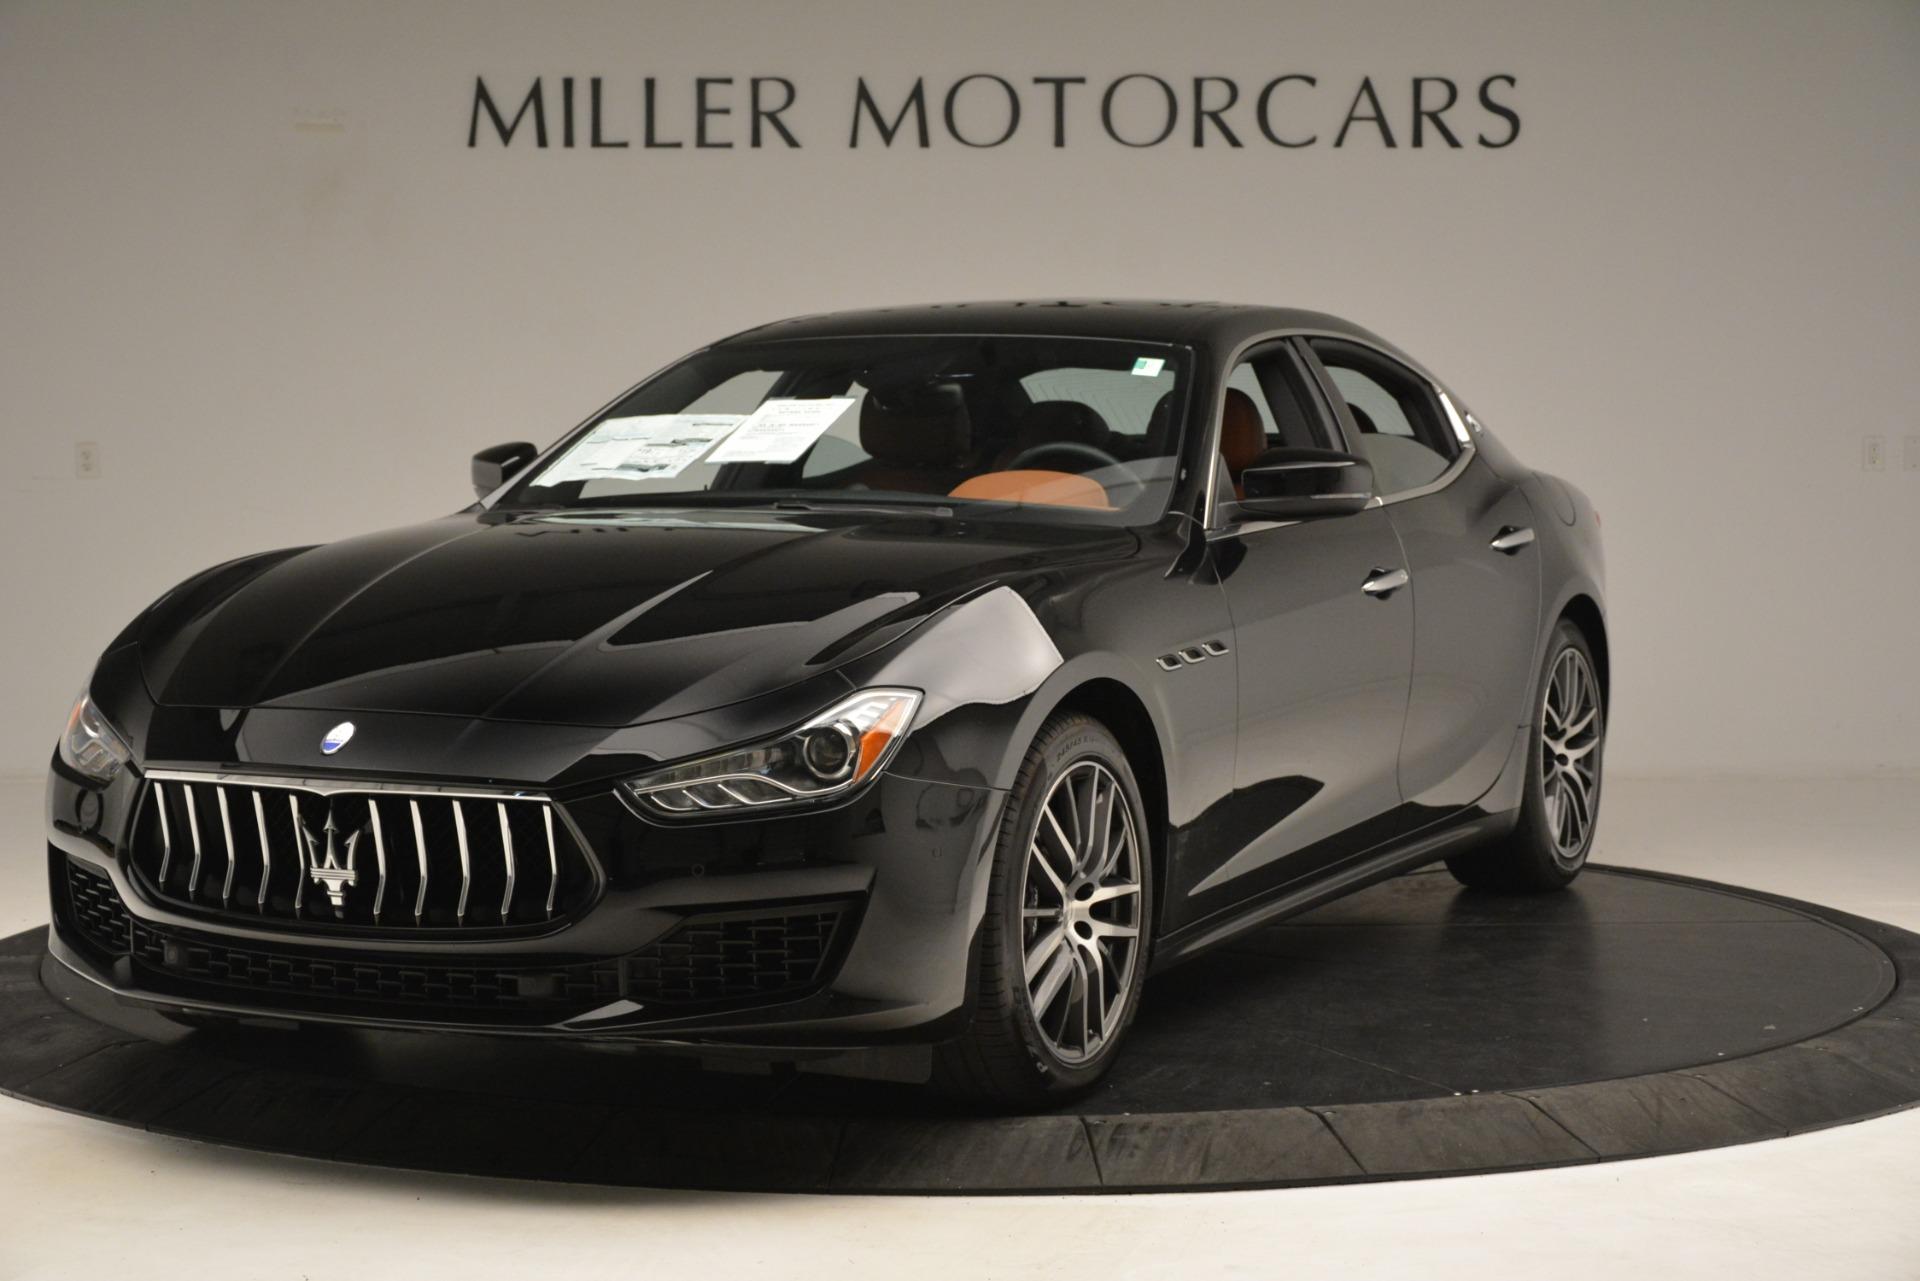 Maserati Ghibli S Q4 >> New 2019 Maserati Ghibli S Q4 For Sale 57 900 Miller